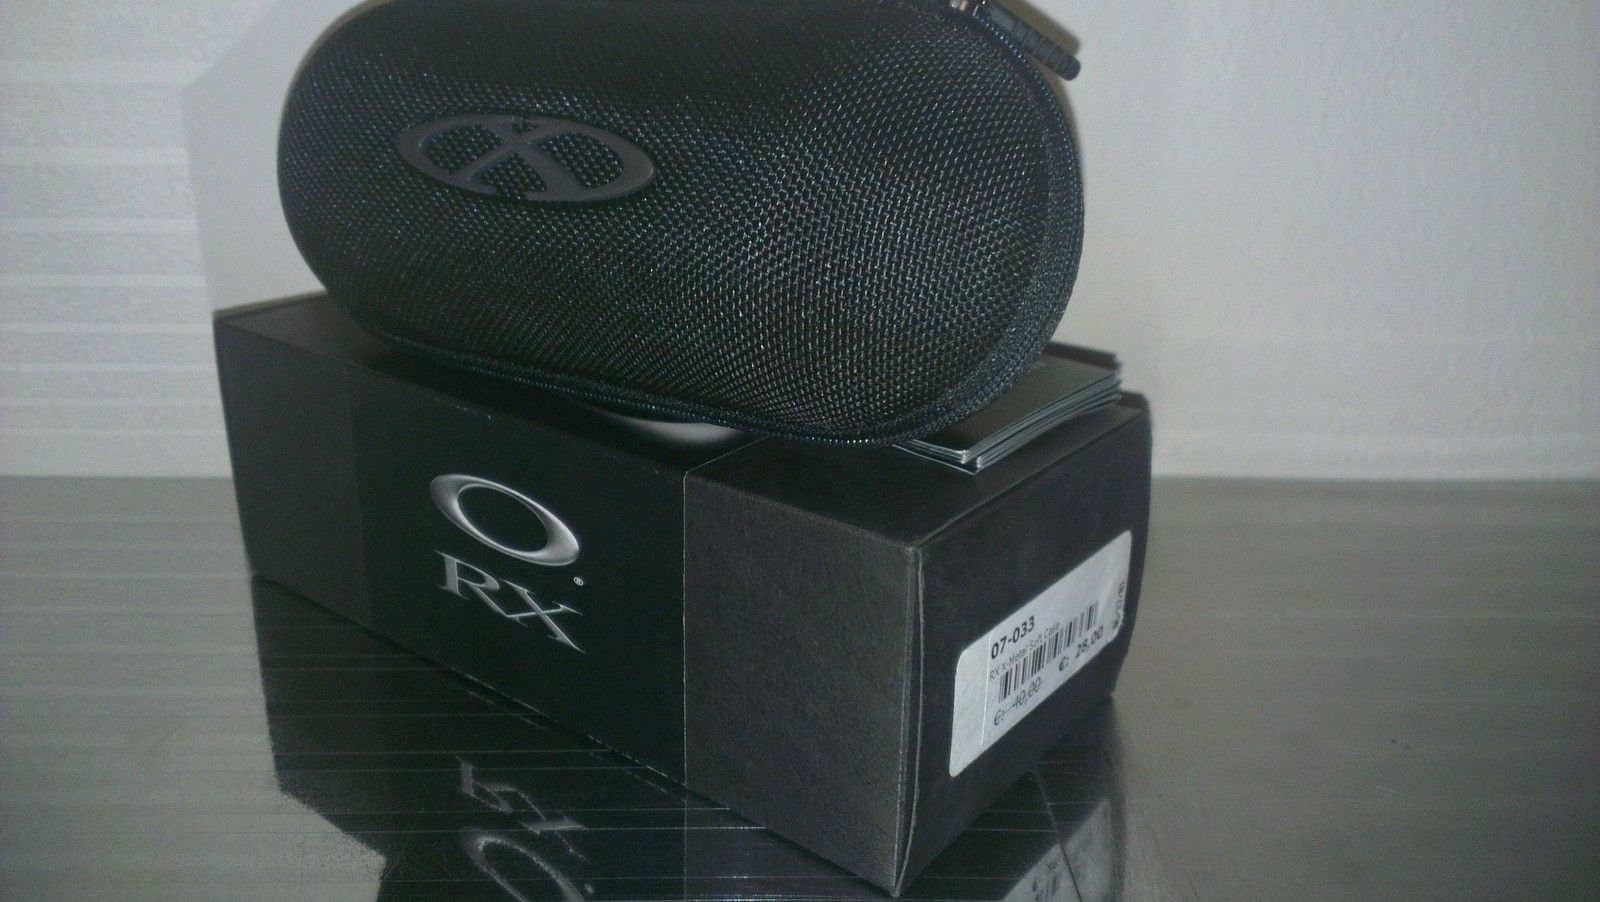 Oakley XMETAL Soft Vault 07-027 (complete W/ Box) - pca3wnzi.jpg